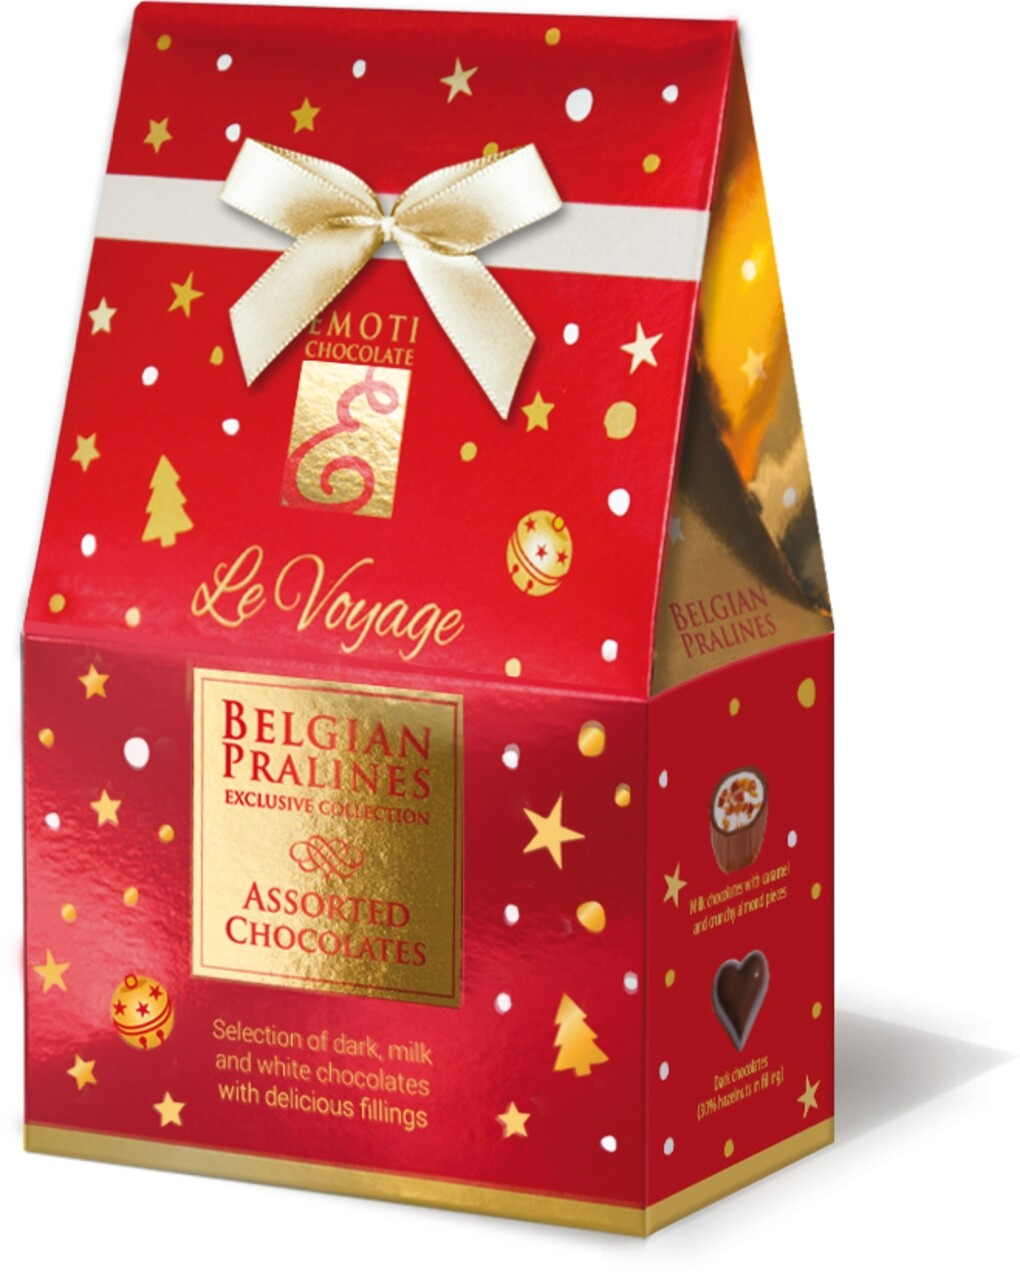 Emoti Le Voyage (Assorted Chocolates) Cutie cu funda 75g